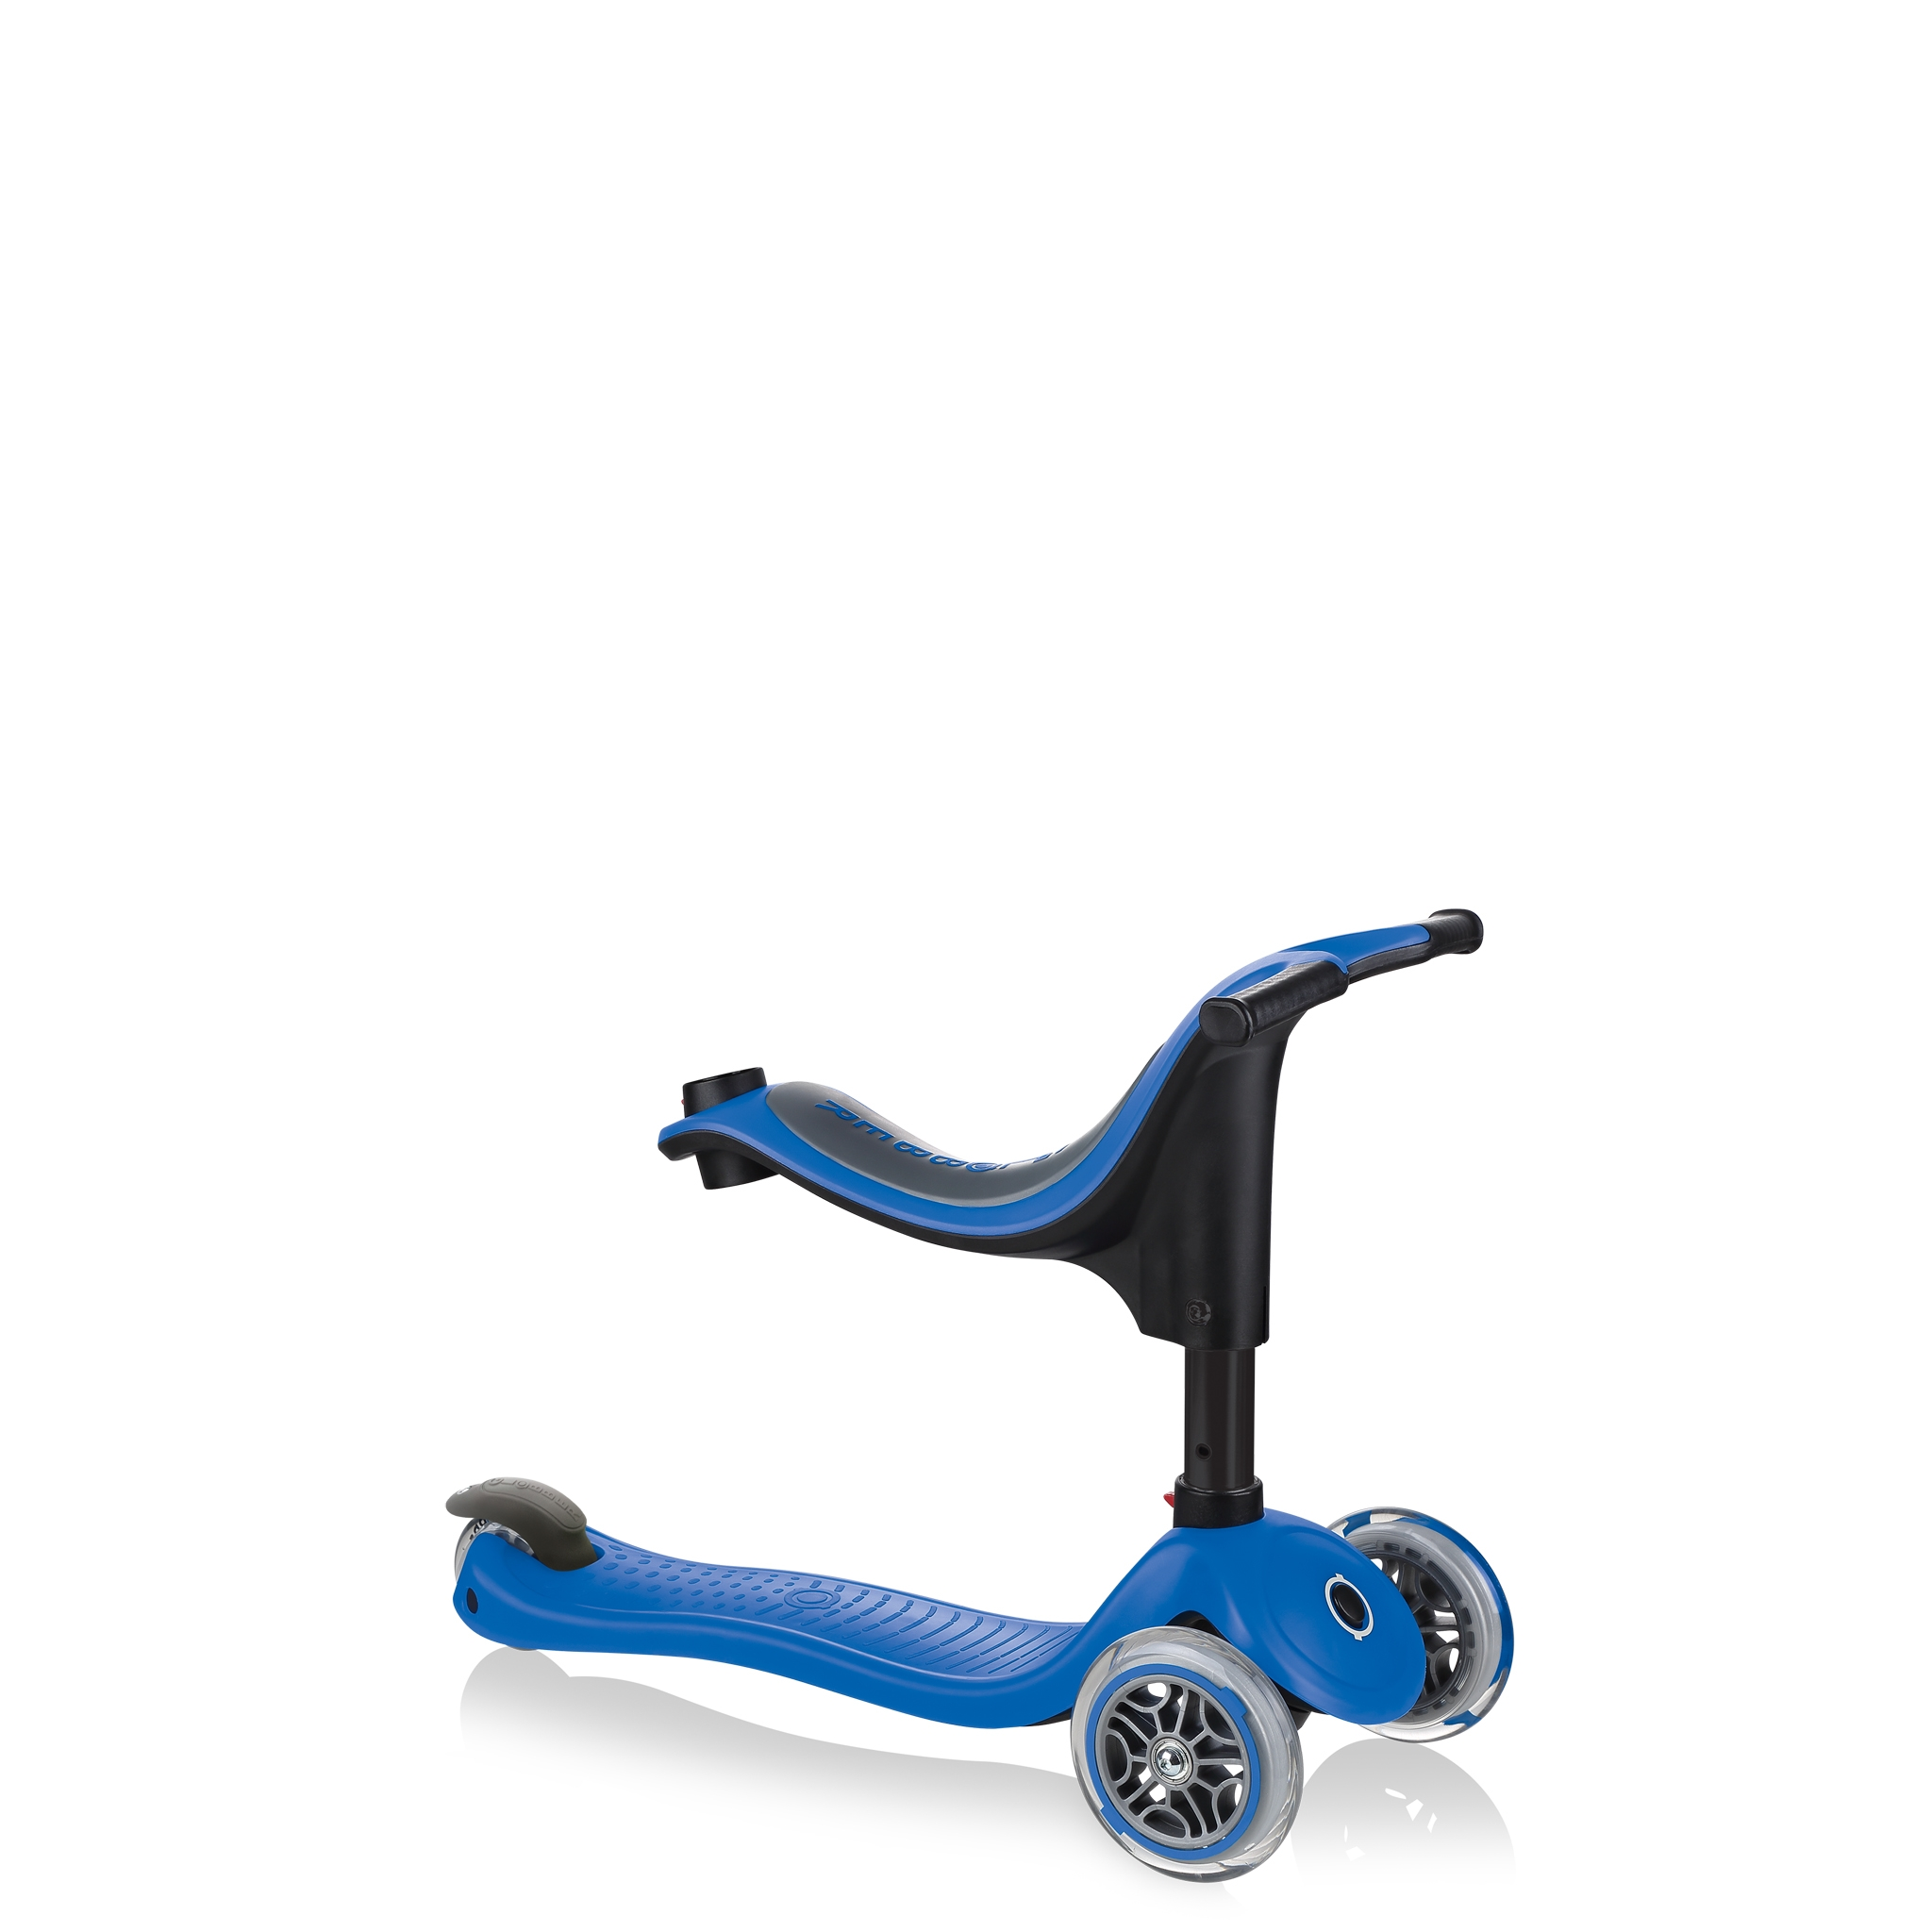 GO-UP-SPORTY-walking-bike-mode-navy-blue